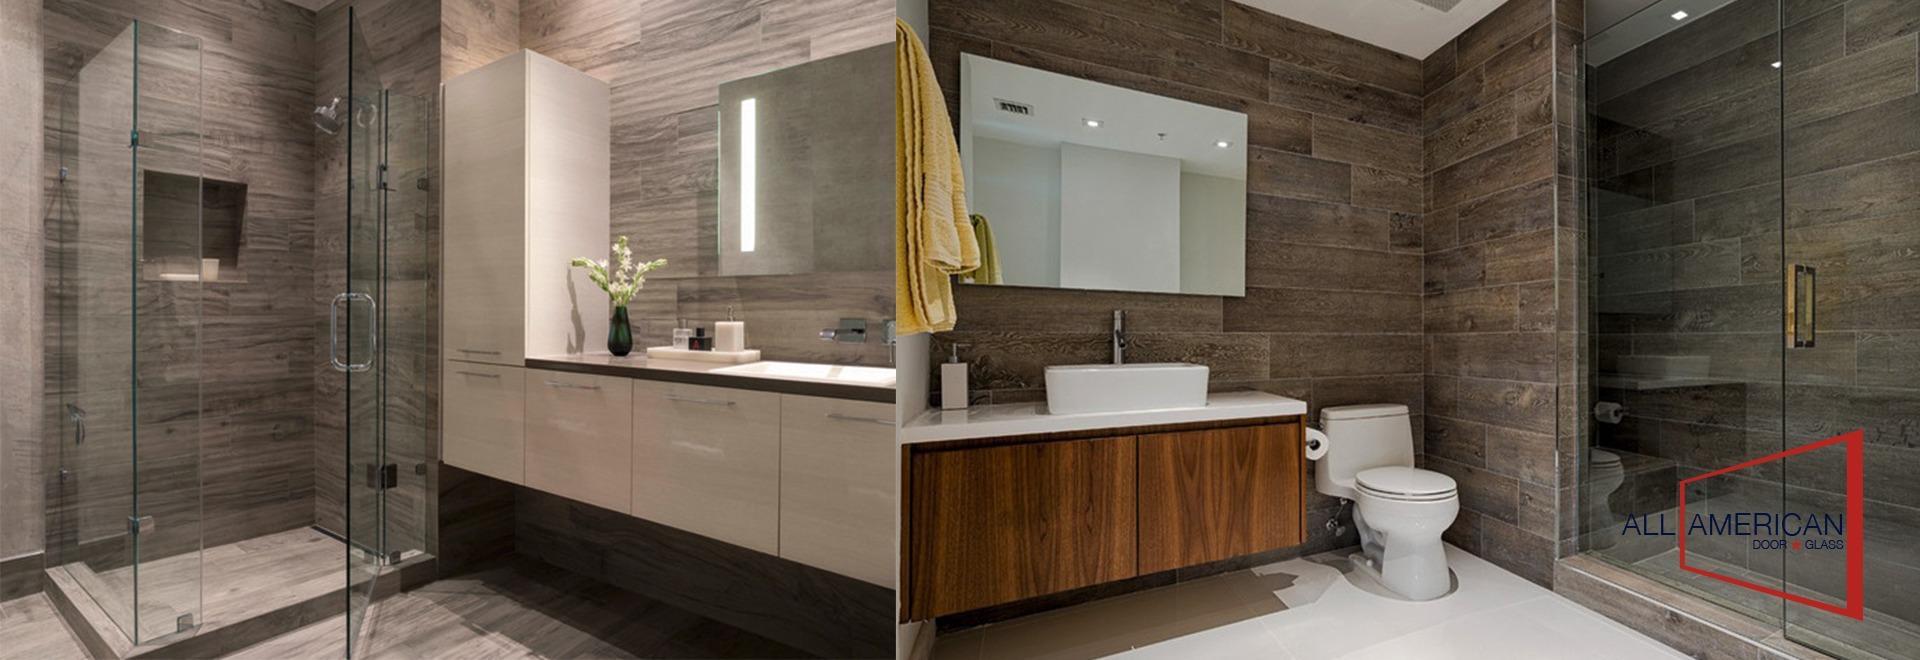 Bathroom Remodeling In Miami FL Miami Florida Bathroom Remodeling IBegin